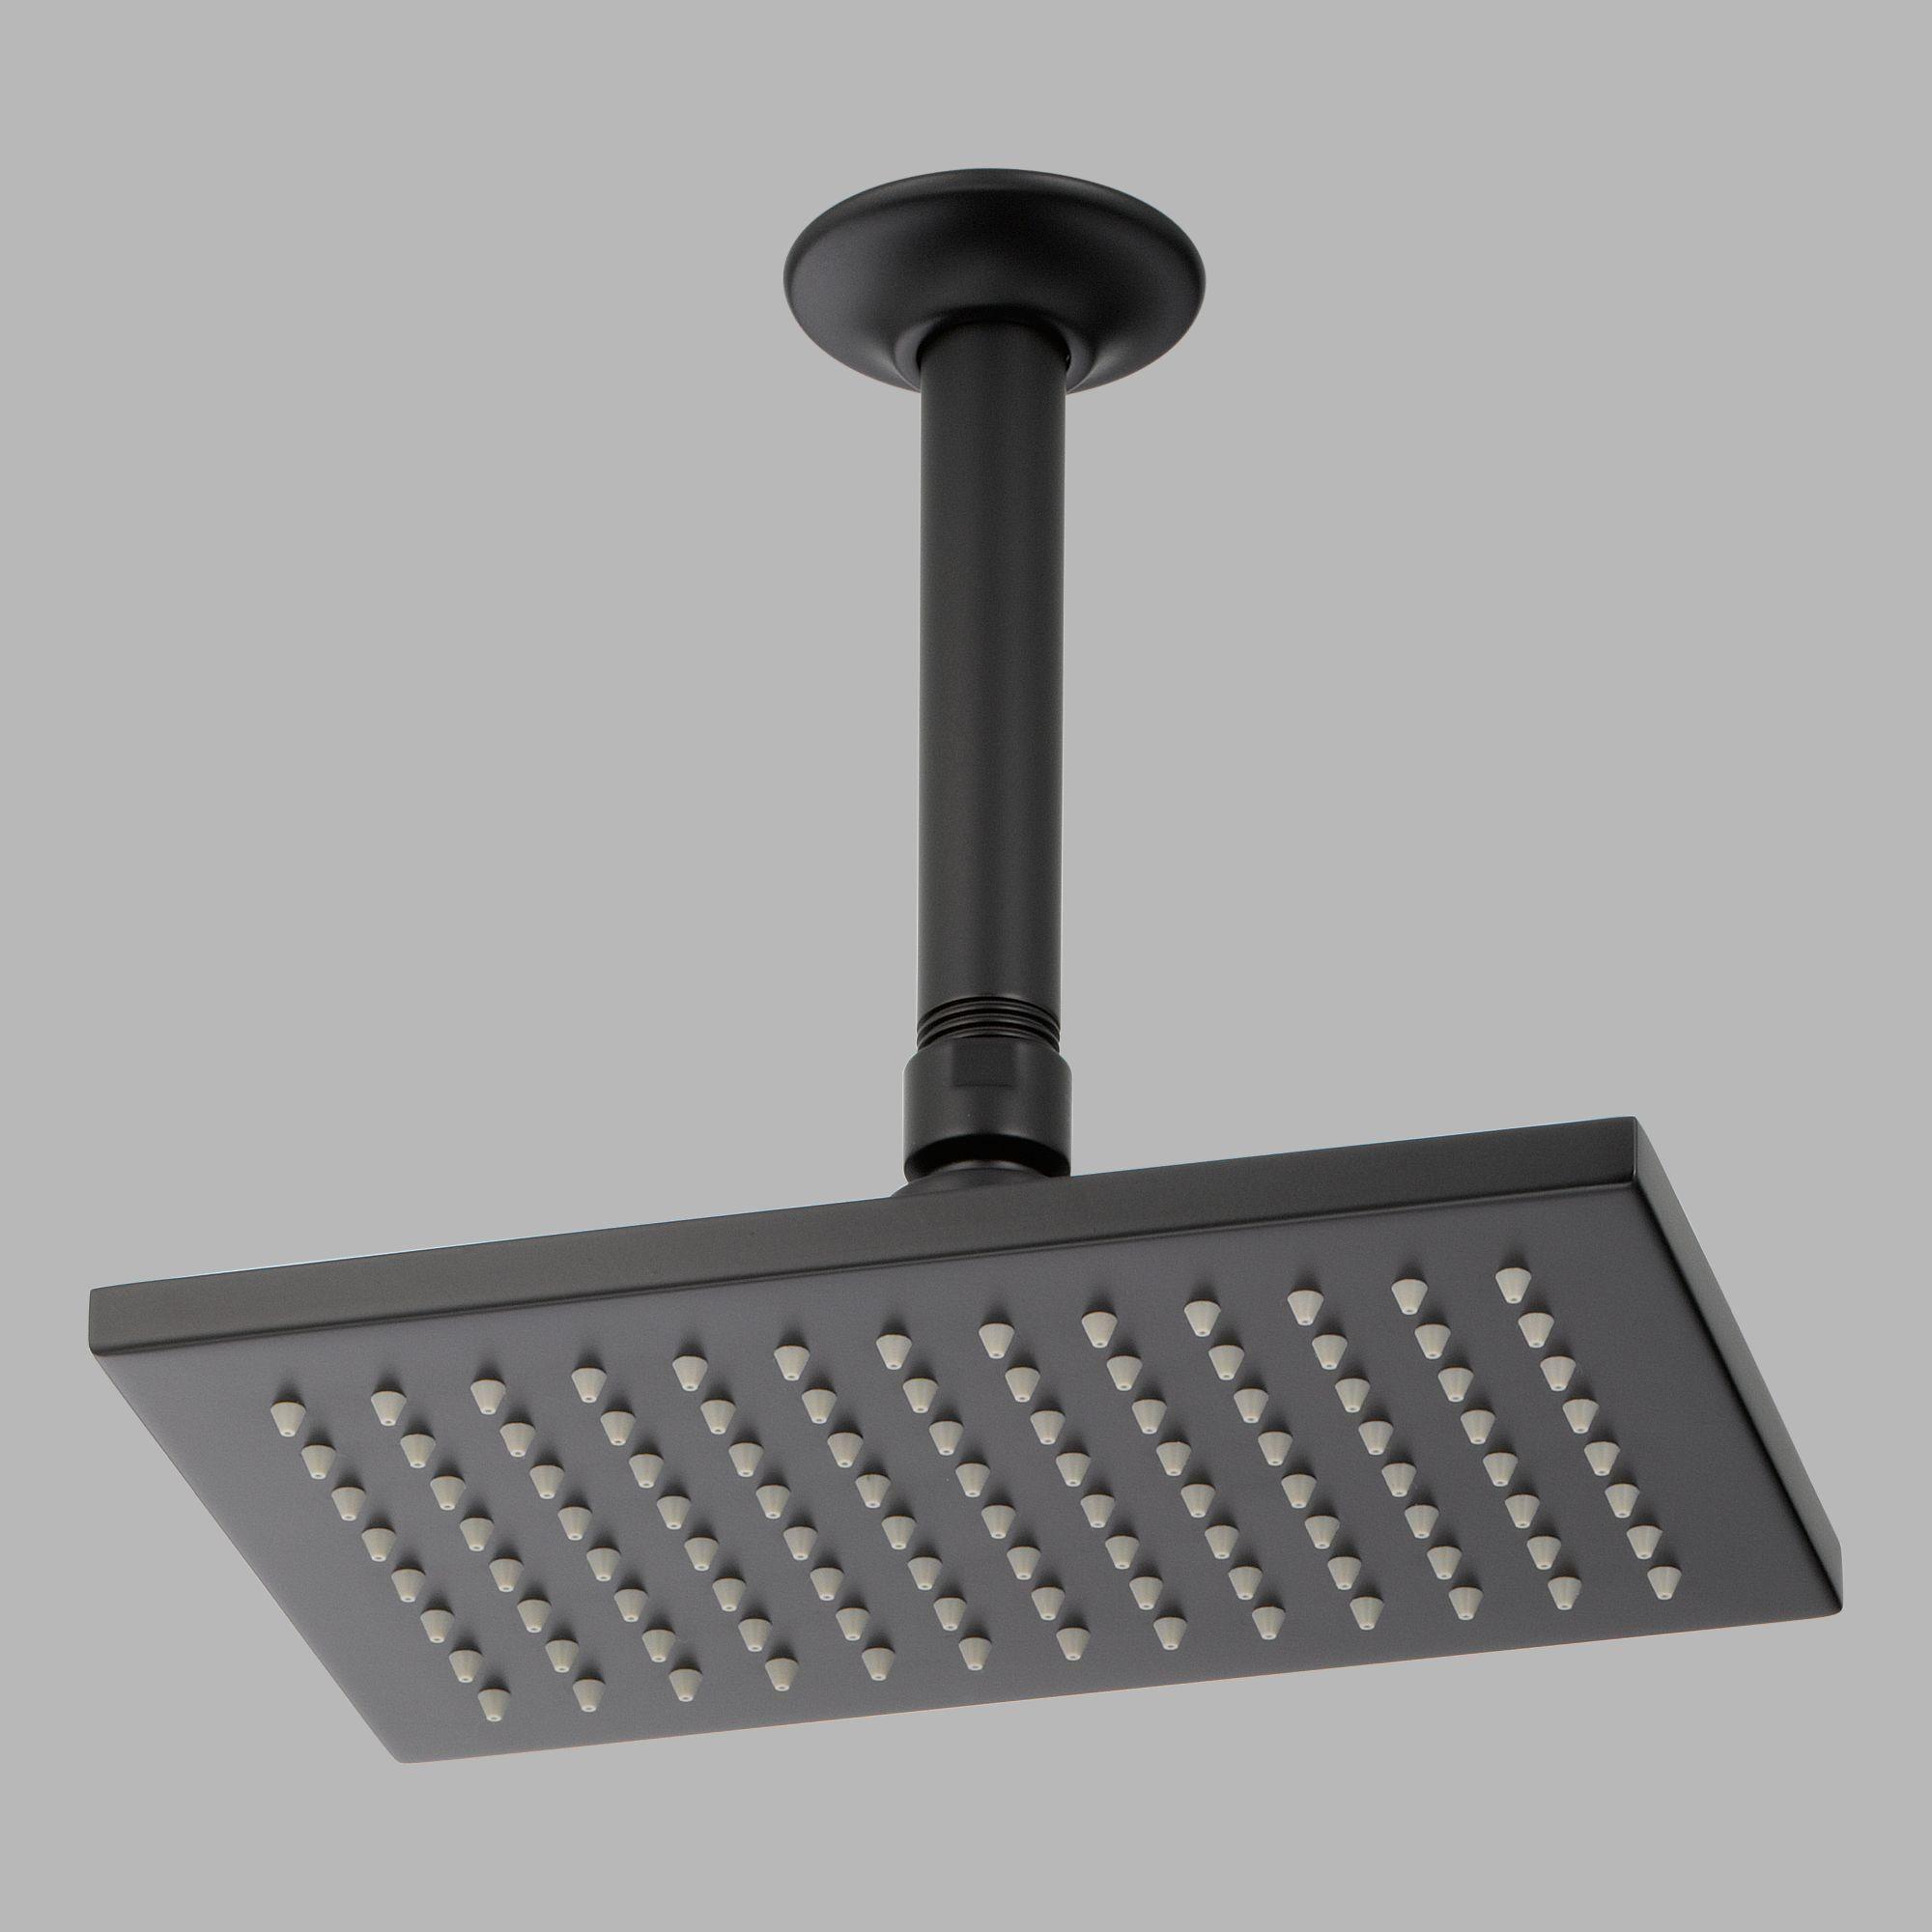 231 Brizo 81380 Single Function Rain Shower Head from the Siderna